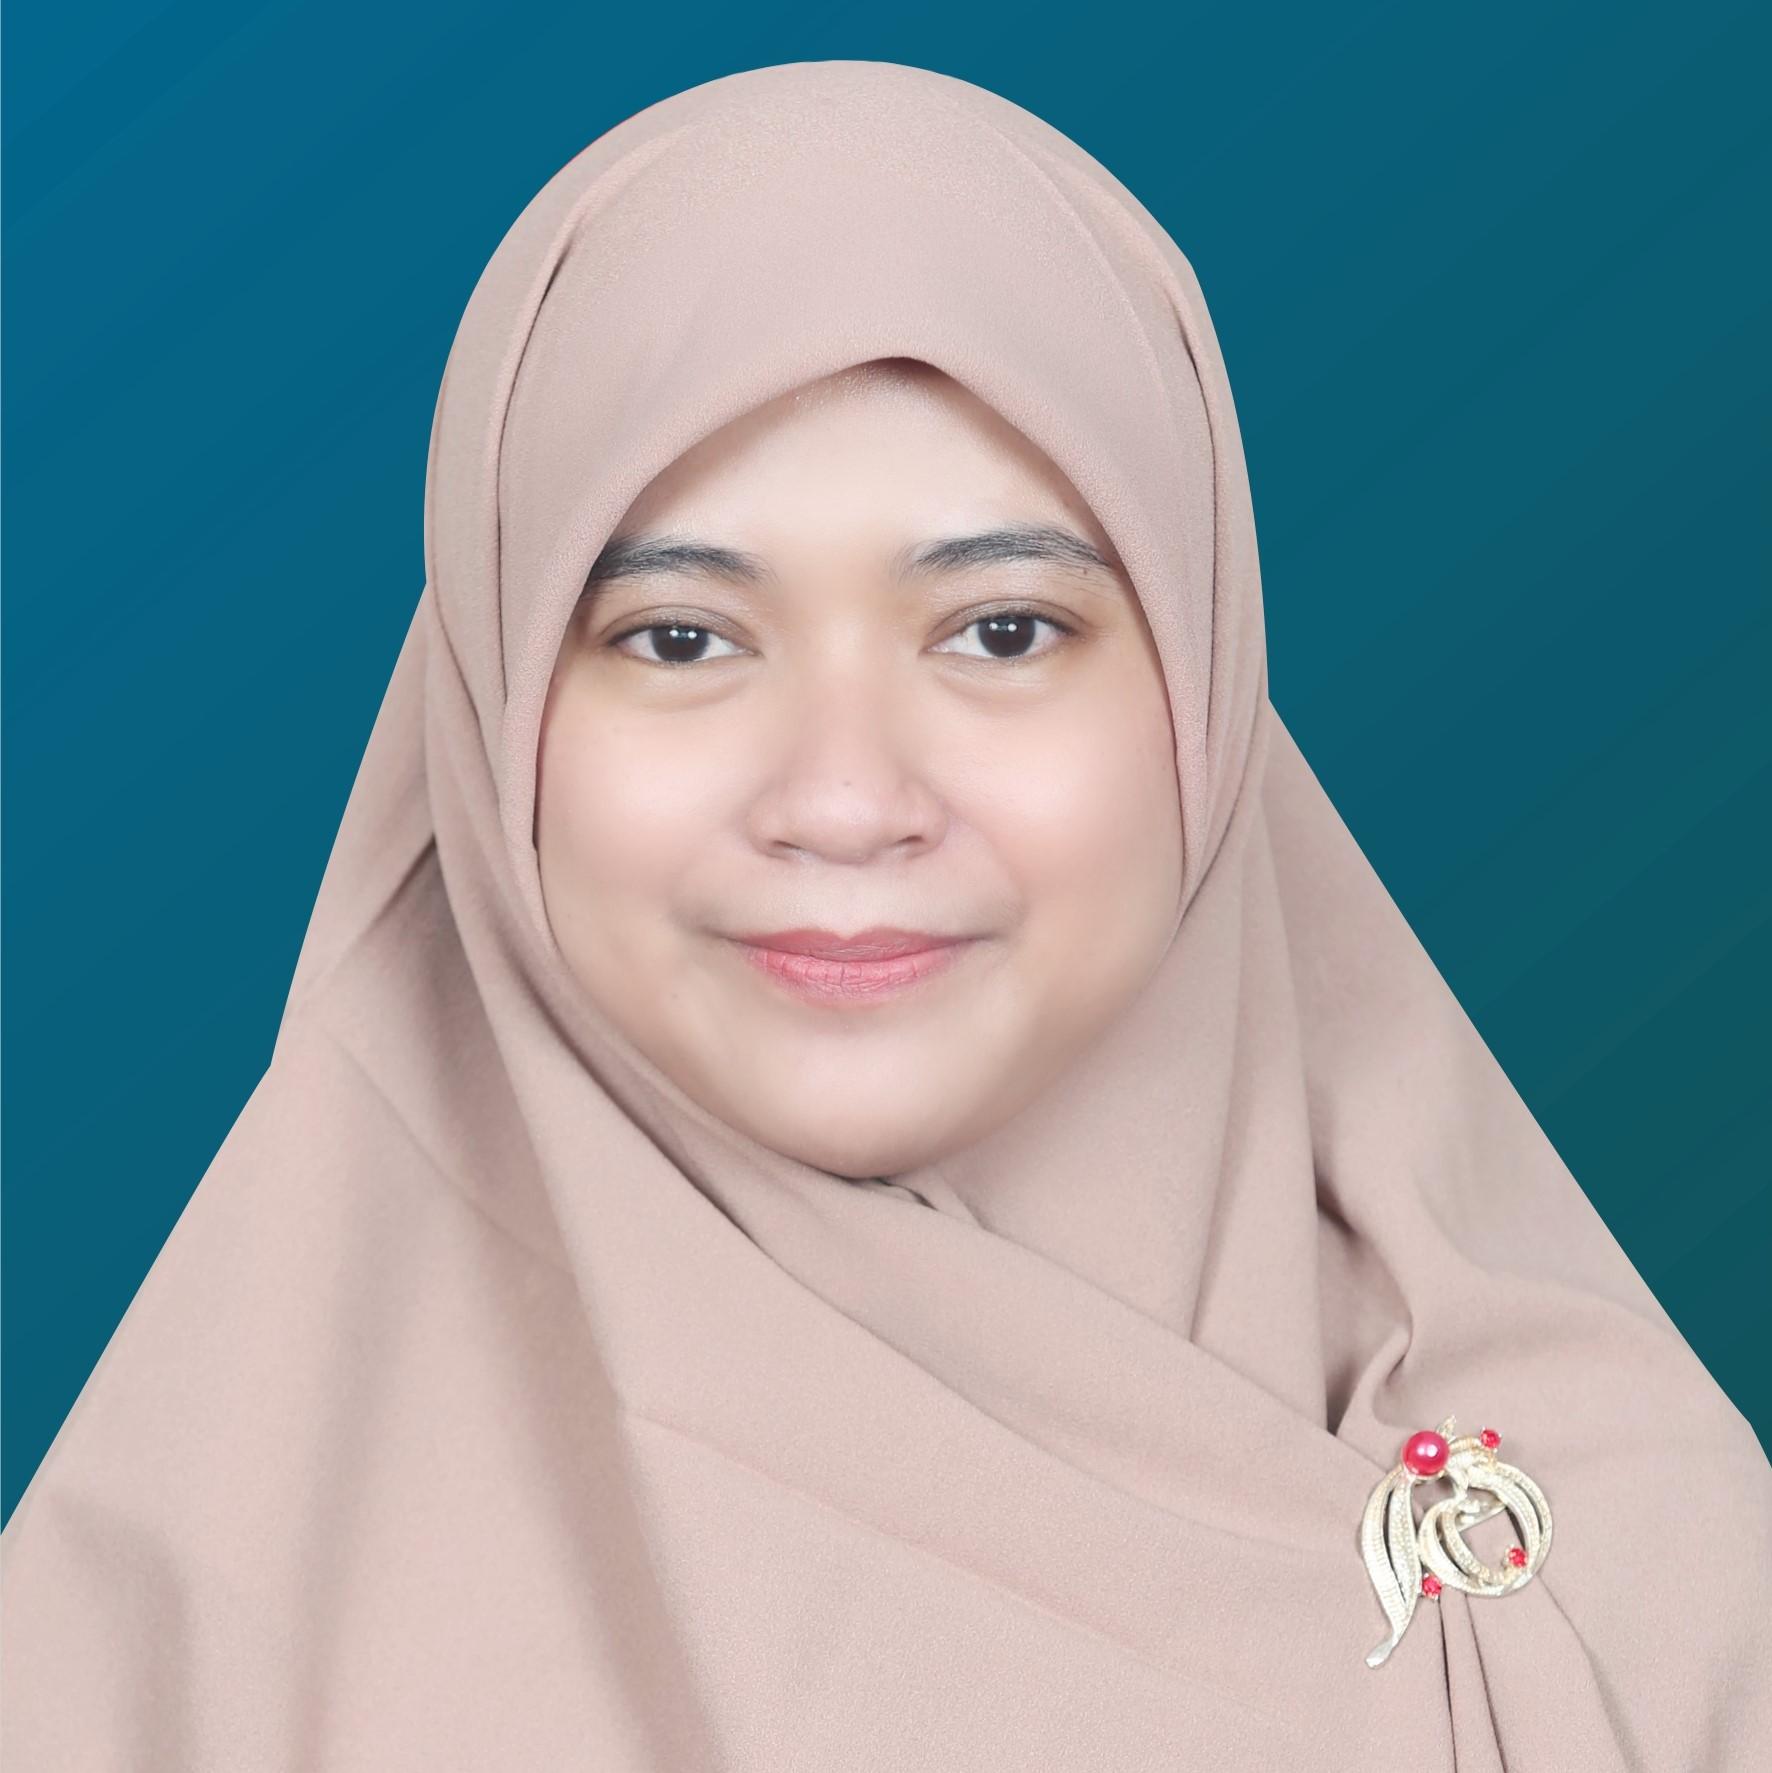 Dr. Ikmi Nur Oktavianti, S.S., M.A.